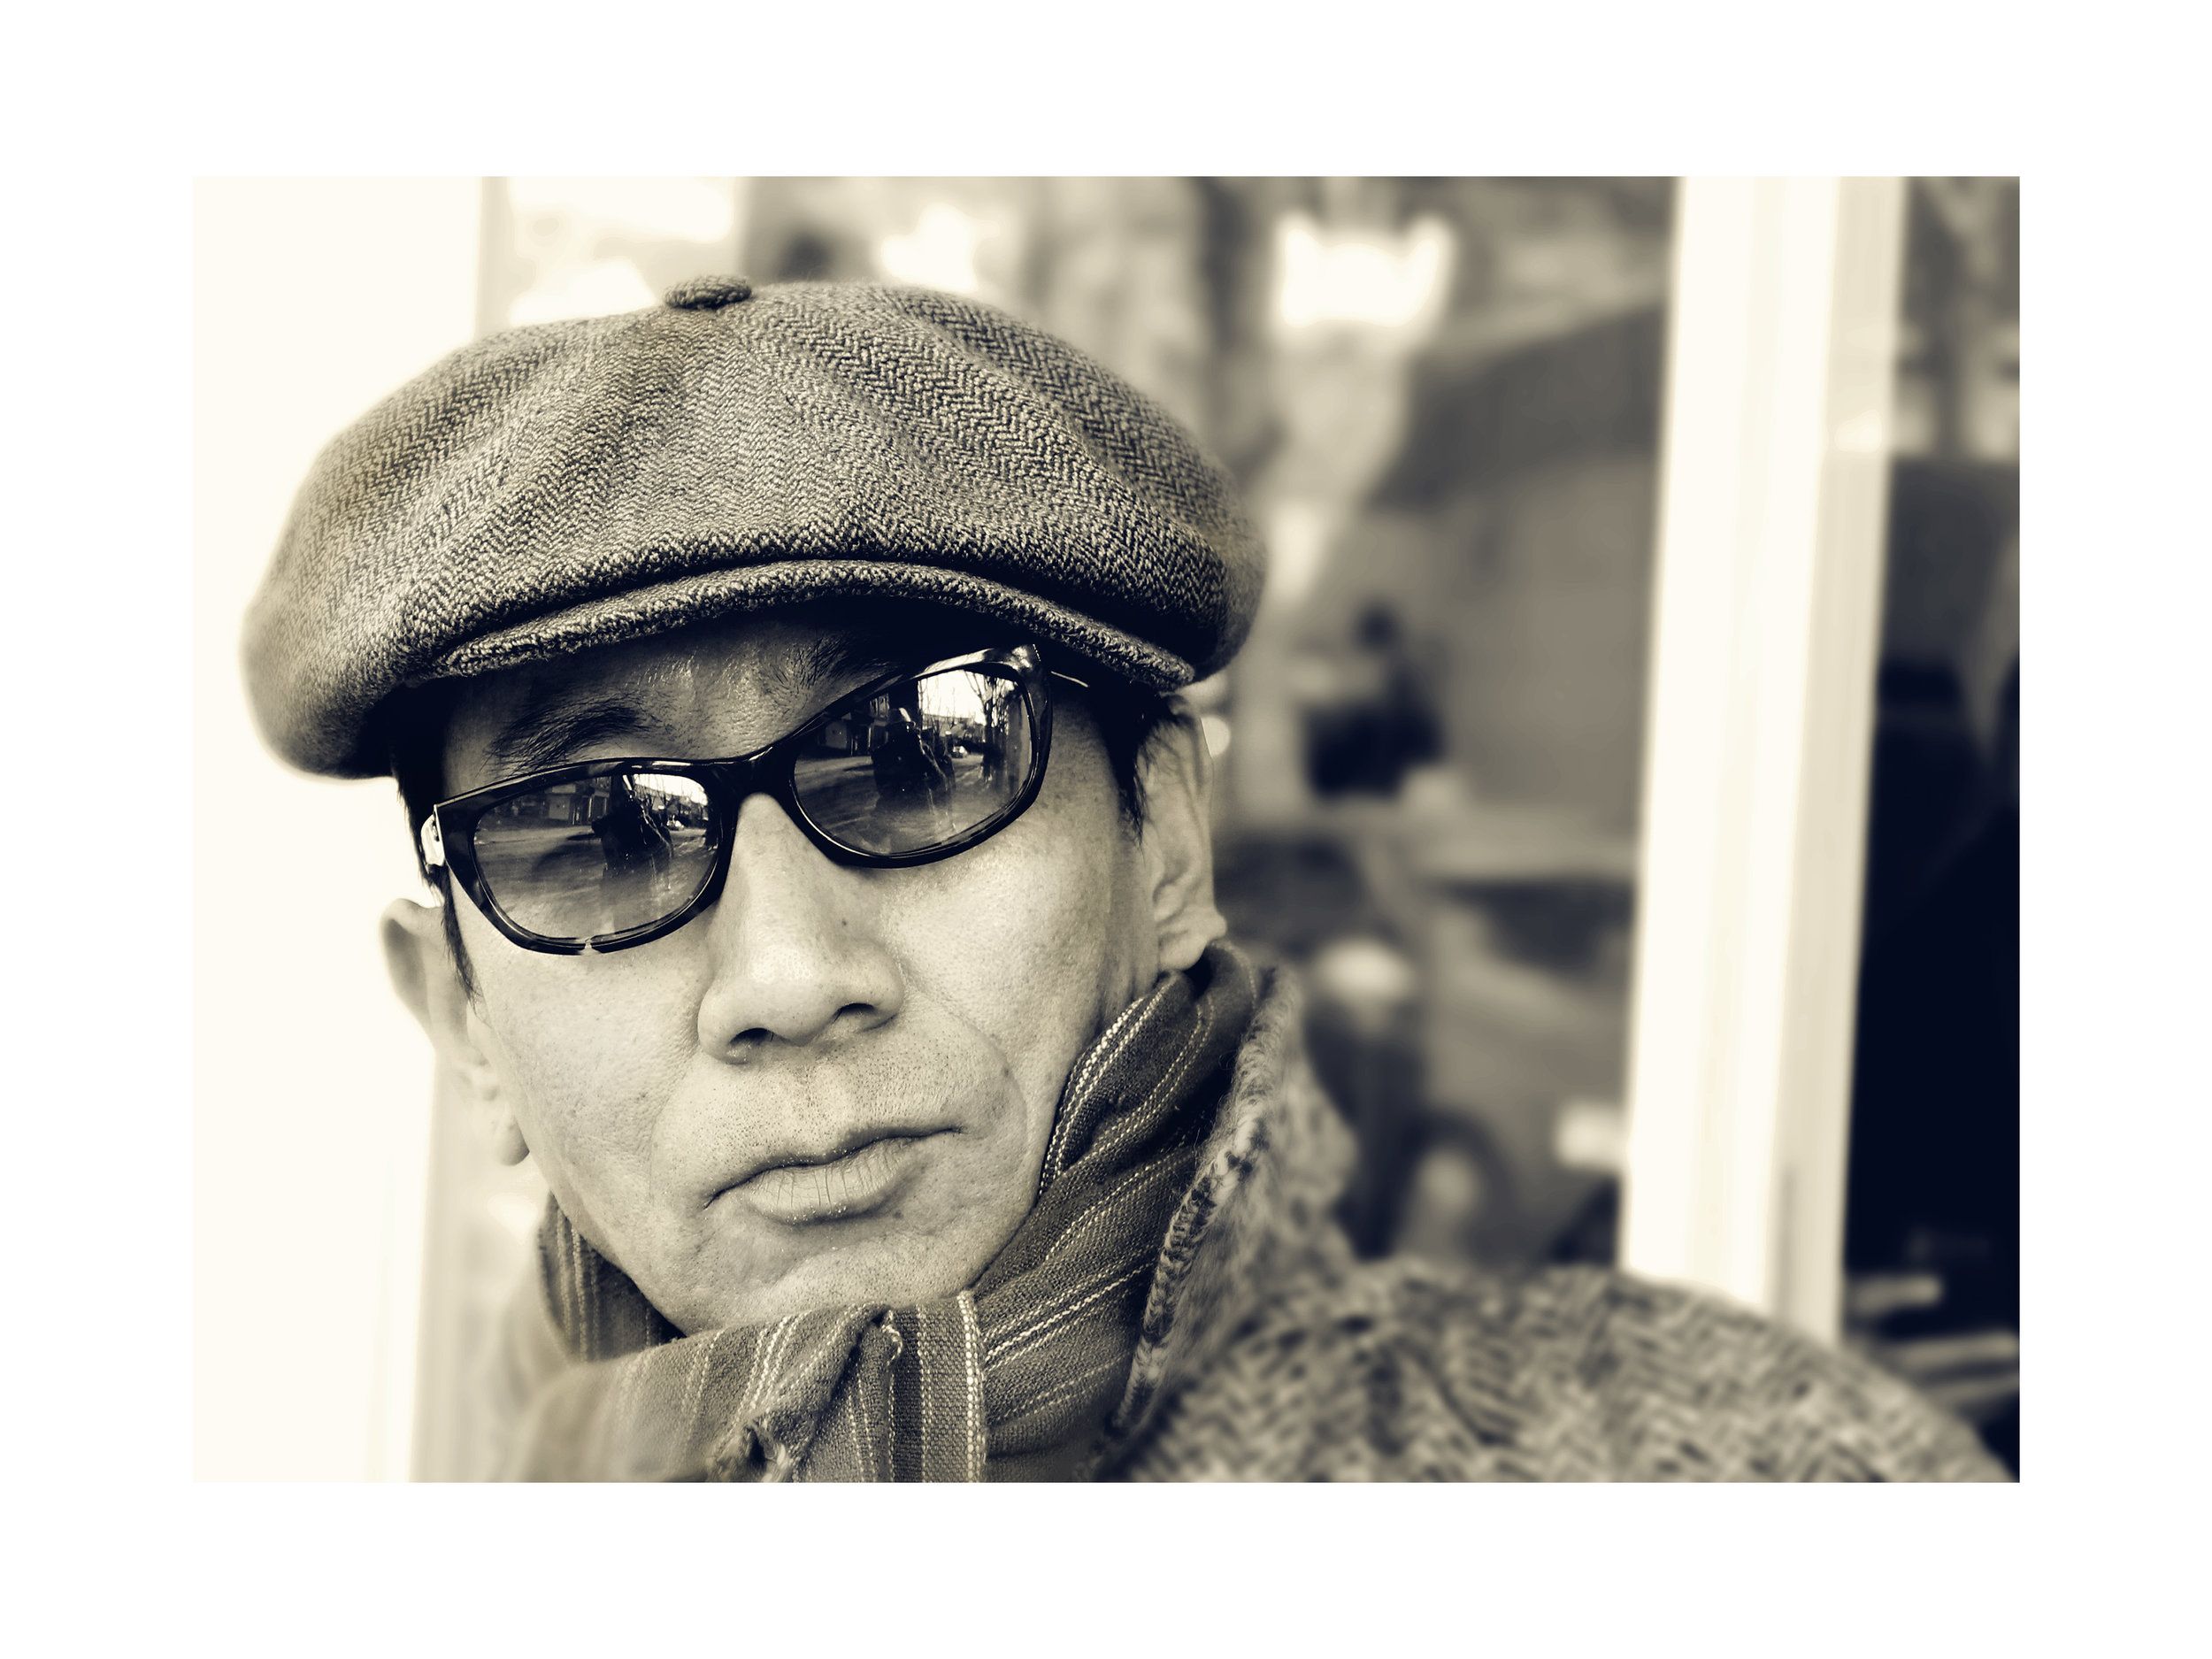 JW_face VI_023.jpg